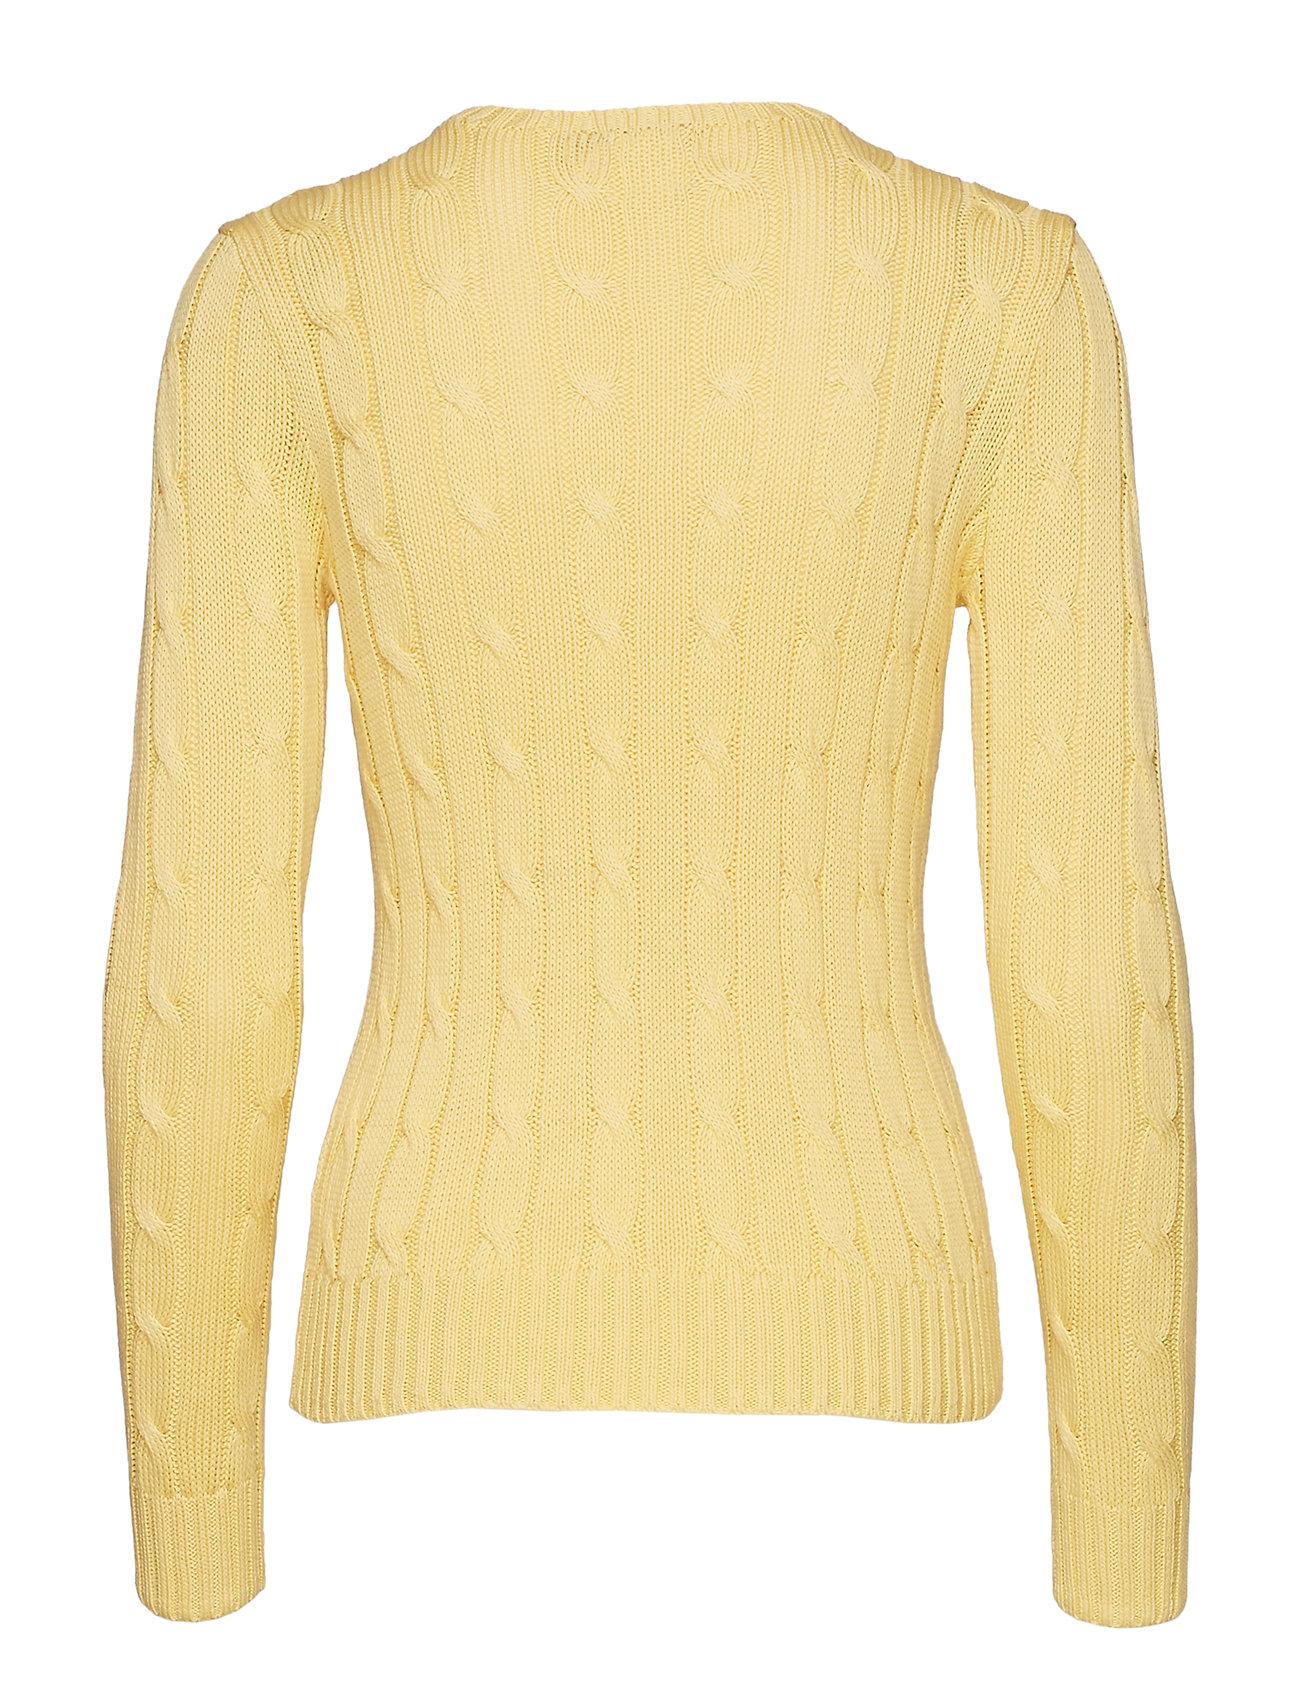 Lauren Crewneck Ralph Cable knit SweaterbuttercreamPolo D9IHY2WE